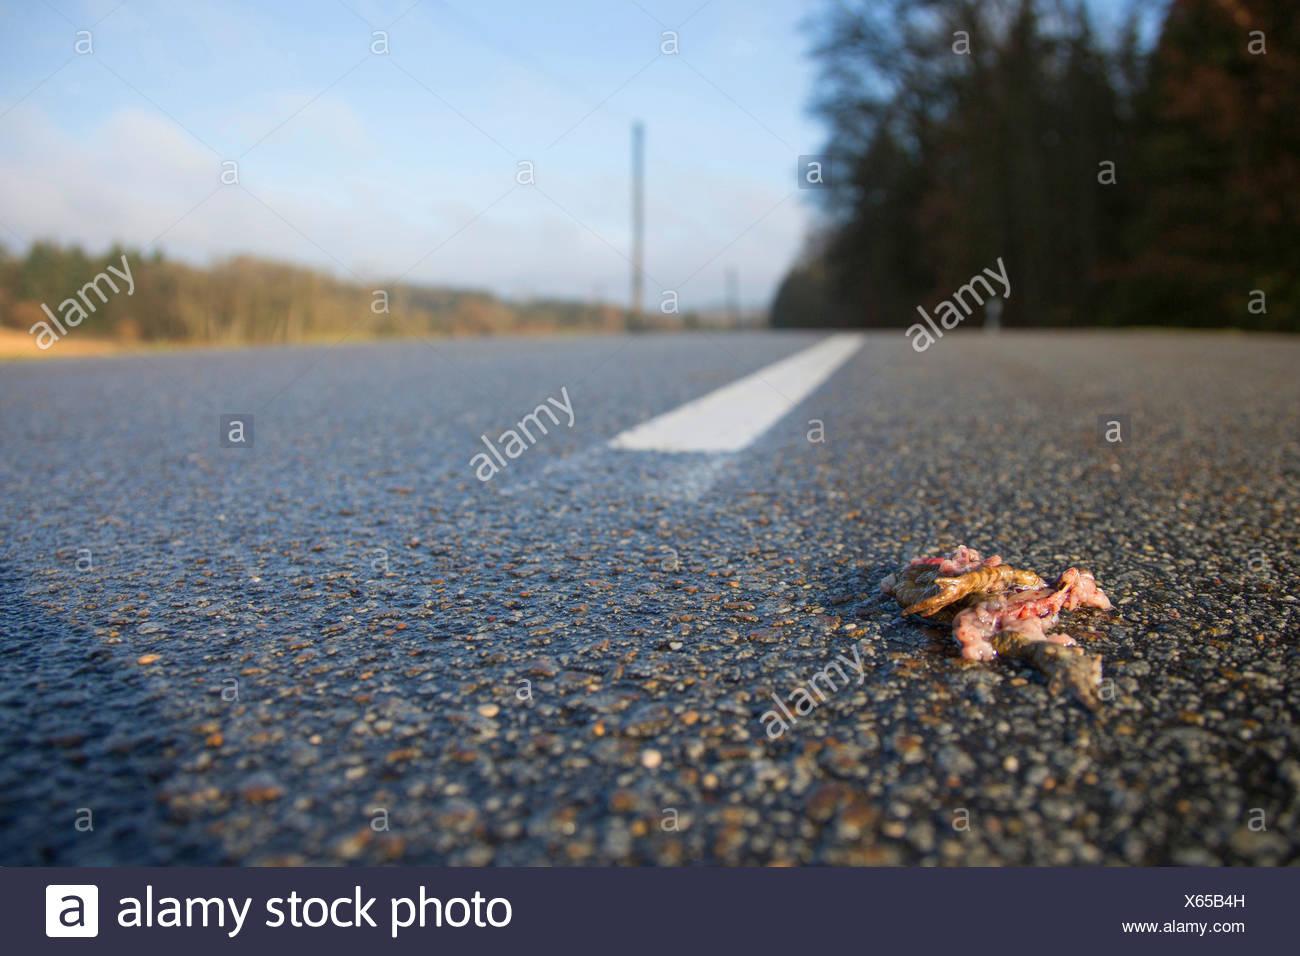 Erdkroete, Erd-Kroete (Bufo bufo), ueberfahren auf Strasse, Deutschland, Bayern, Niederbayern | European common toad (Bufo bufo) Stock Photo